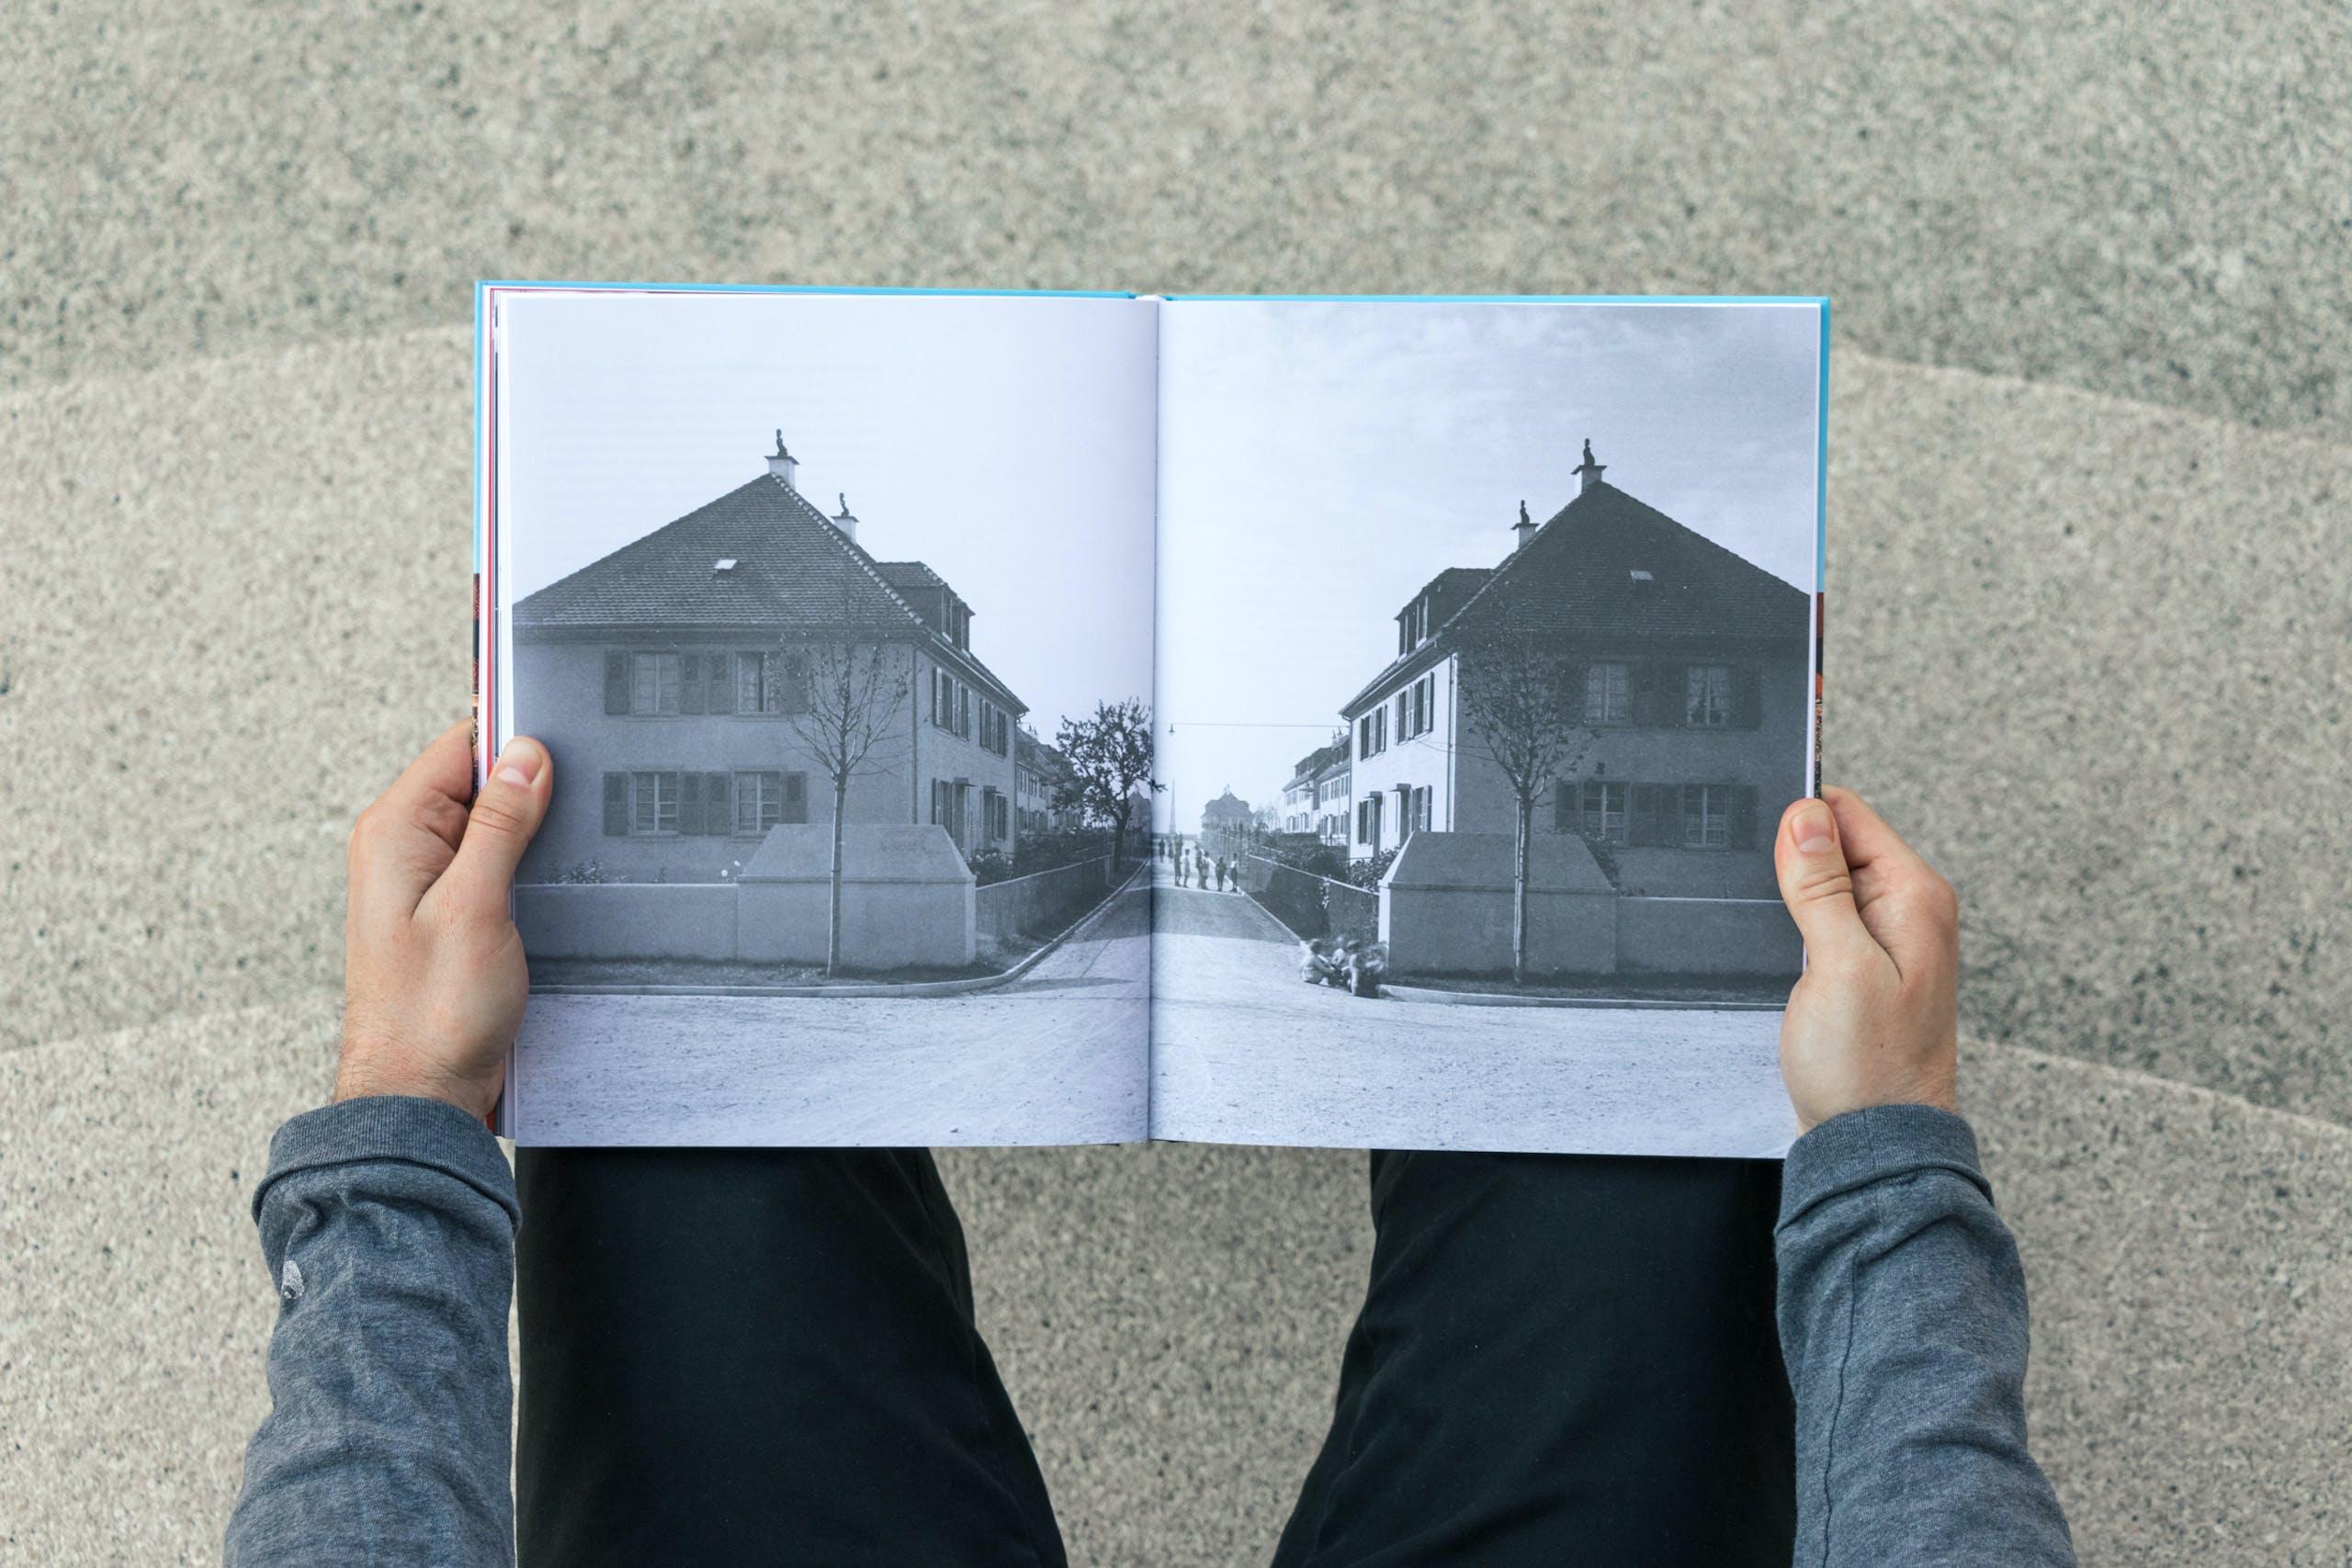 Freidorf Muttenz, Cedric Kegreiss, Grafik, Visuelle Gestaltung, Design, Book, Buch, Publikation, CMS, Basel